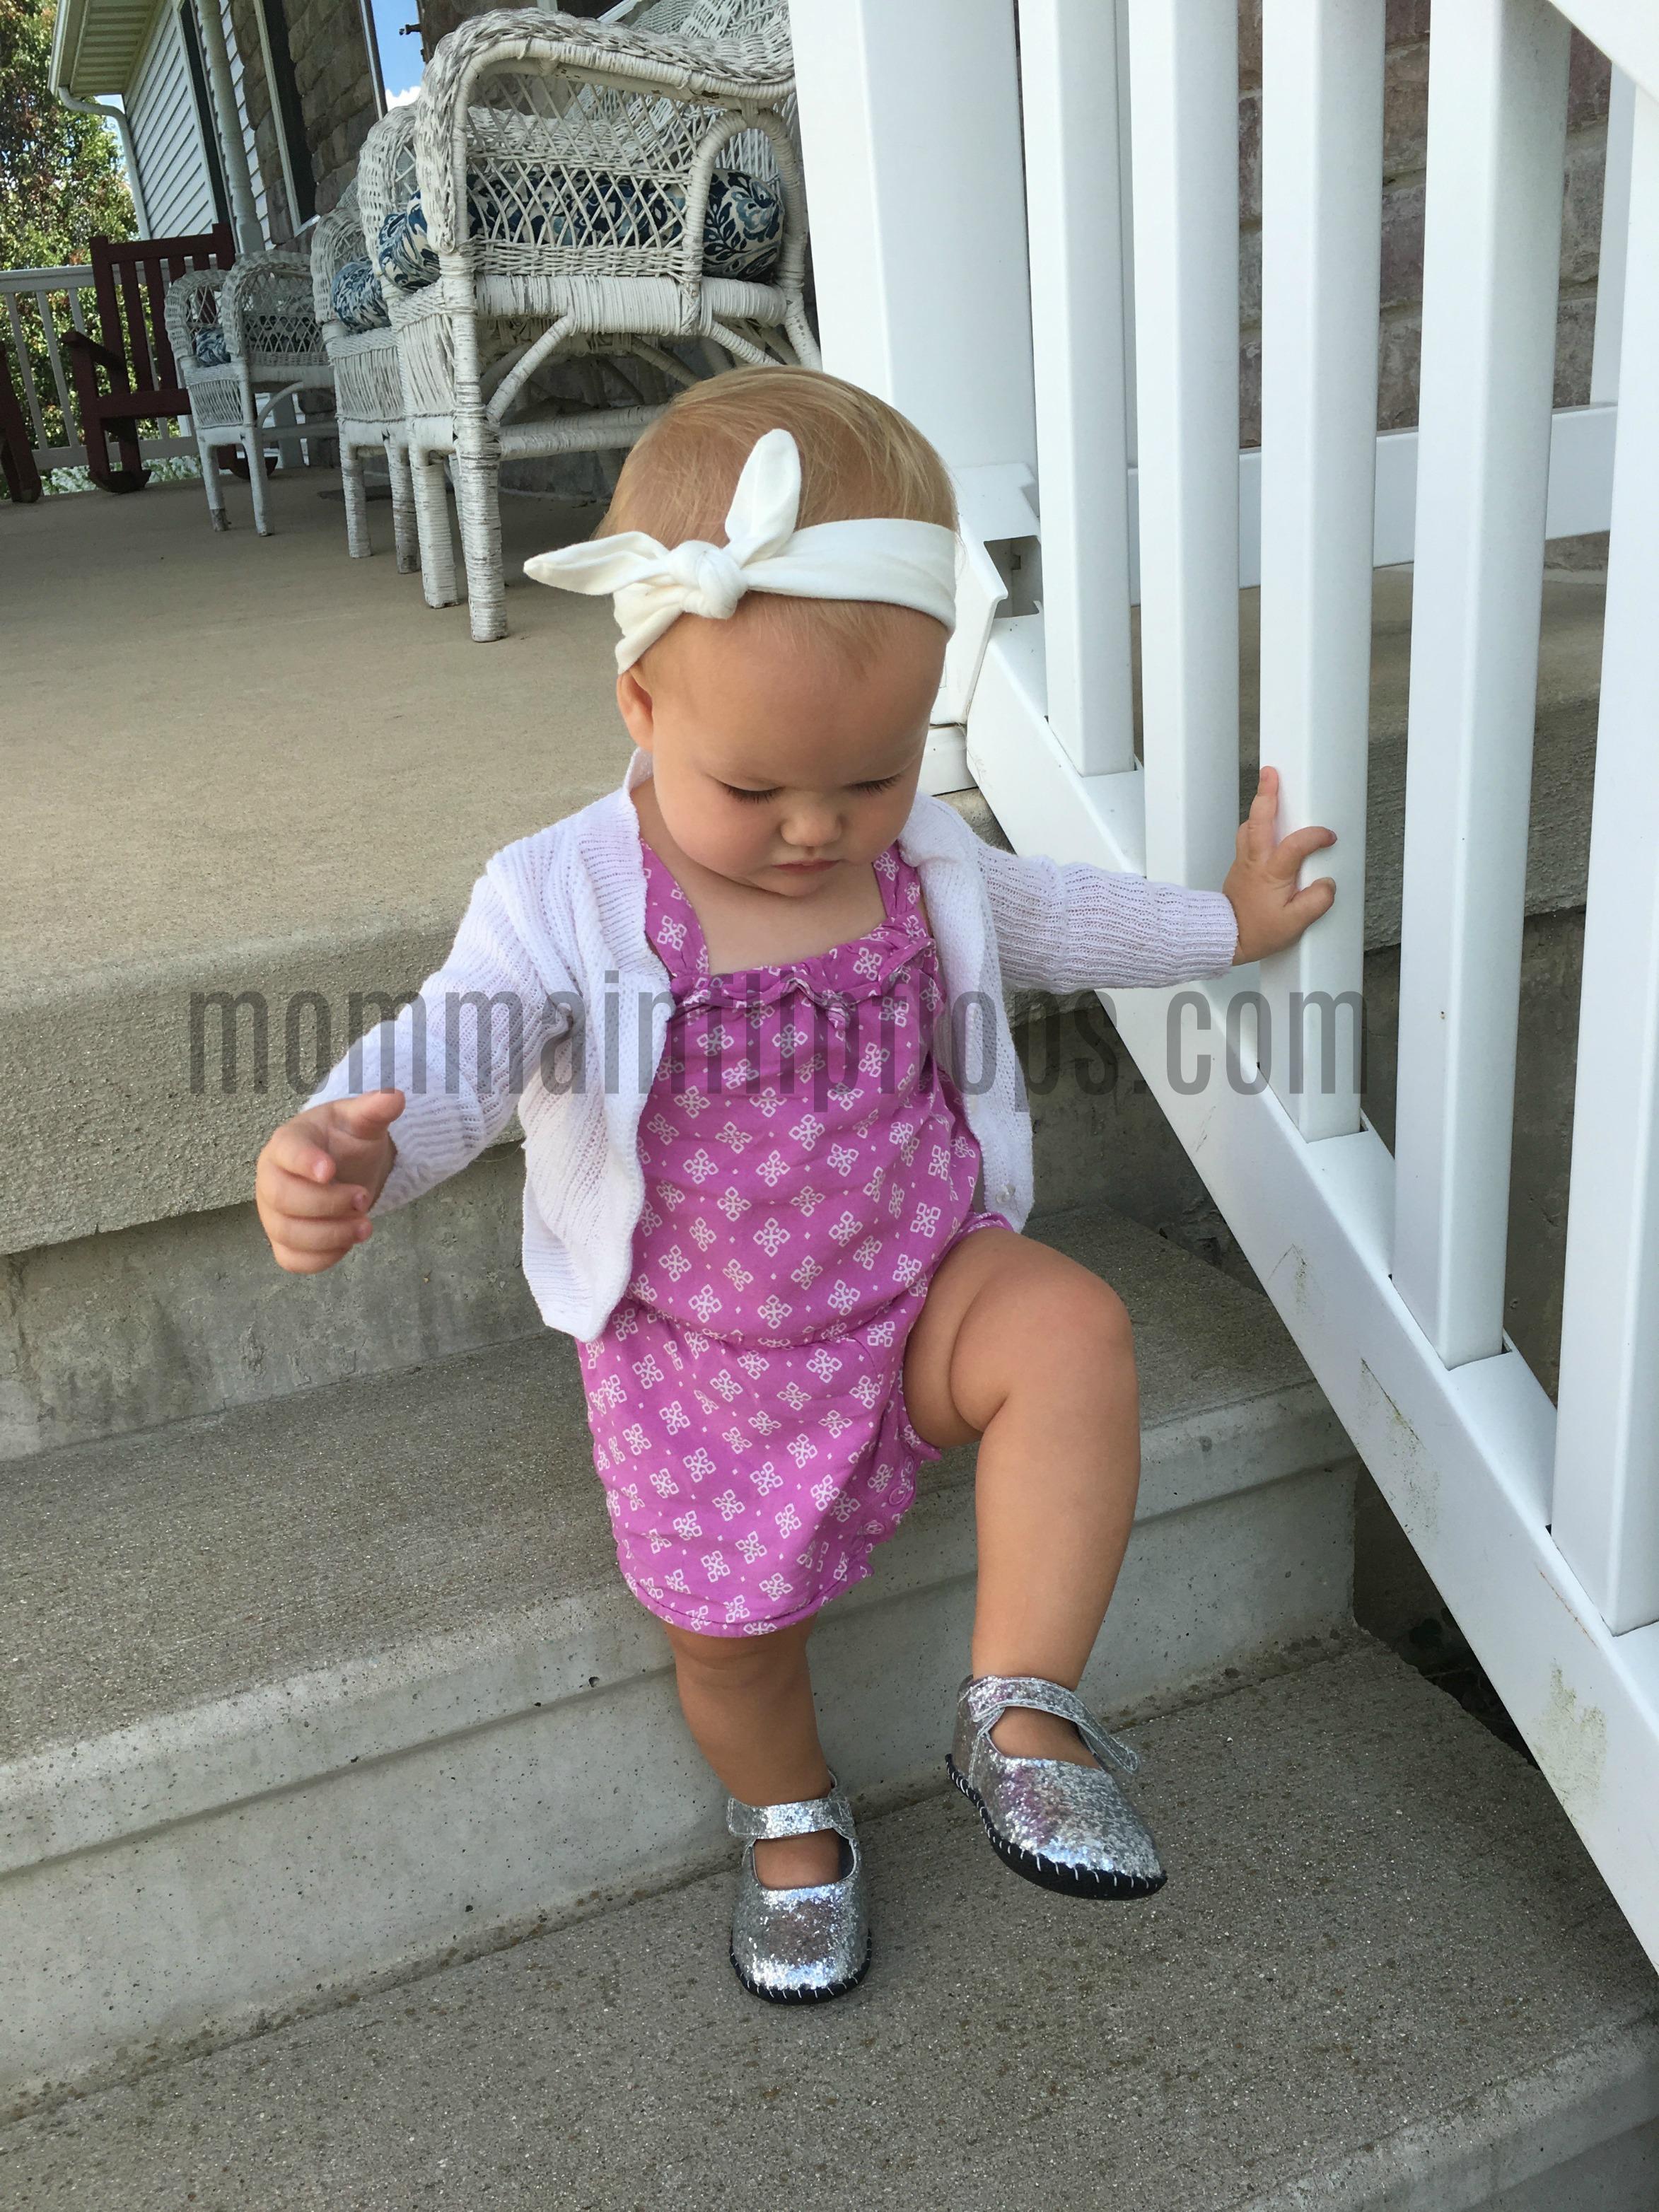 Sparkling Little Girls Shoes from Pediped Footwear - momma in flip flops